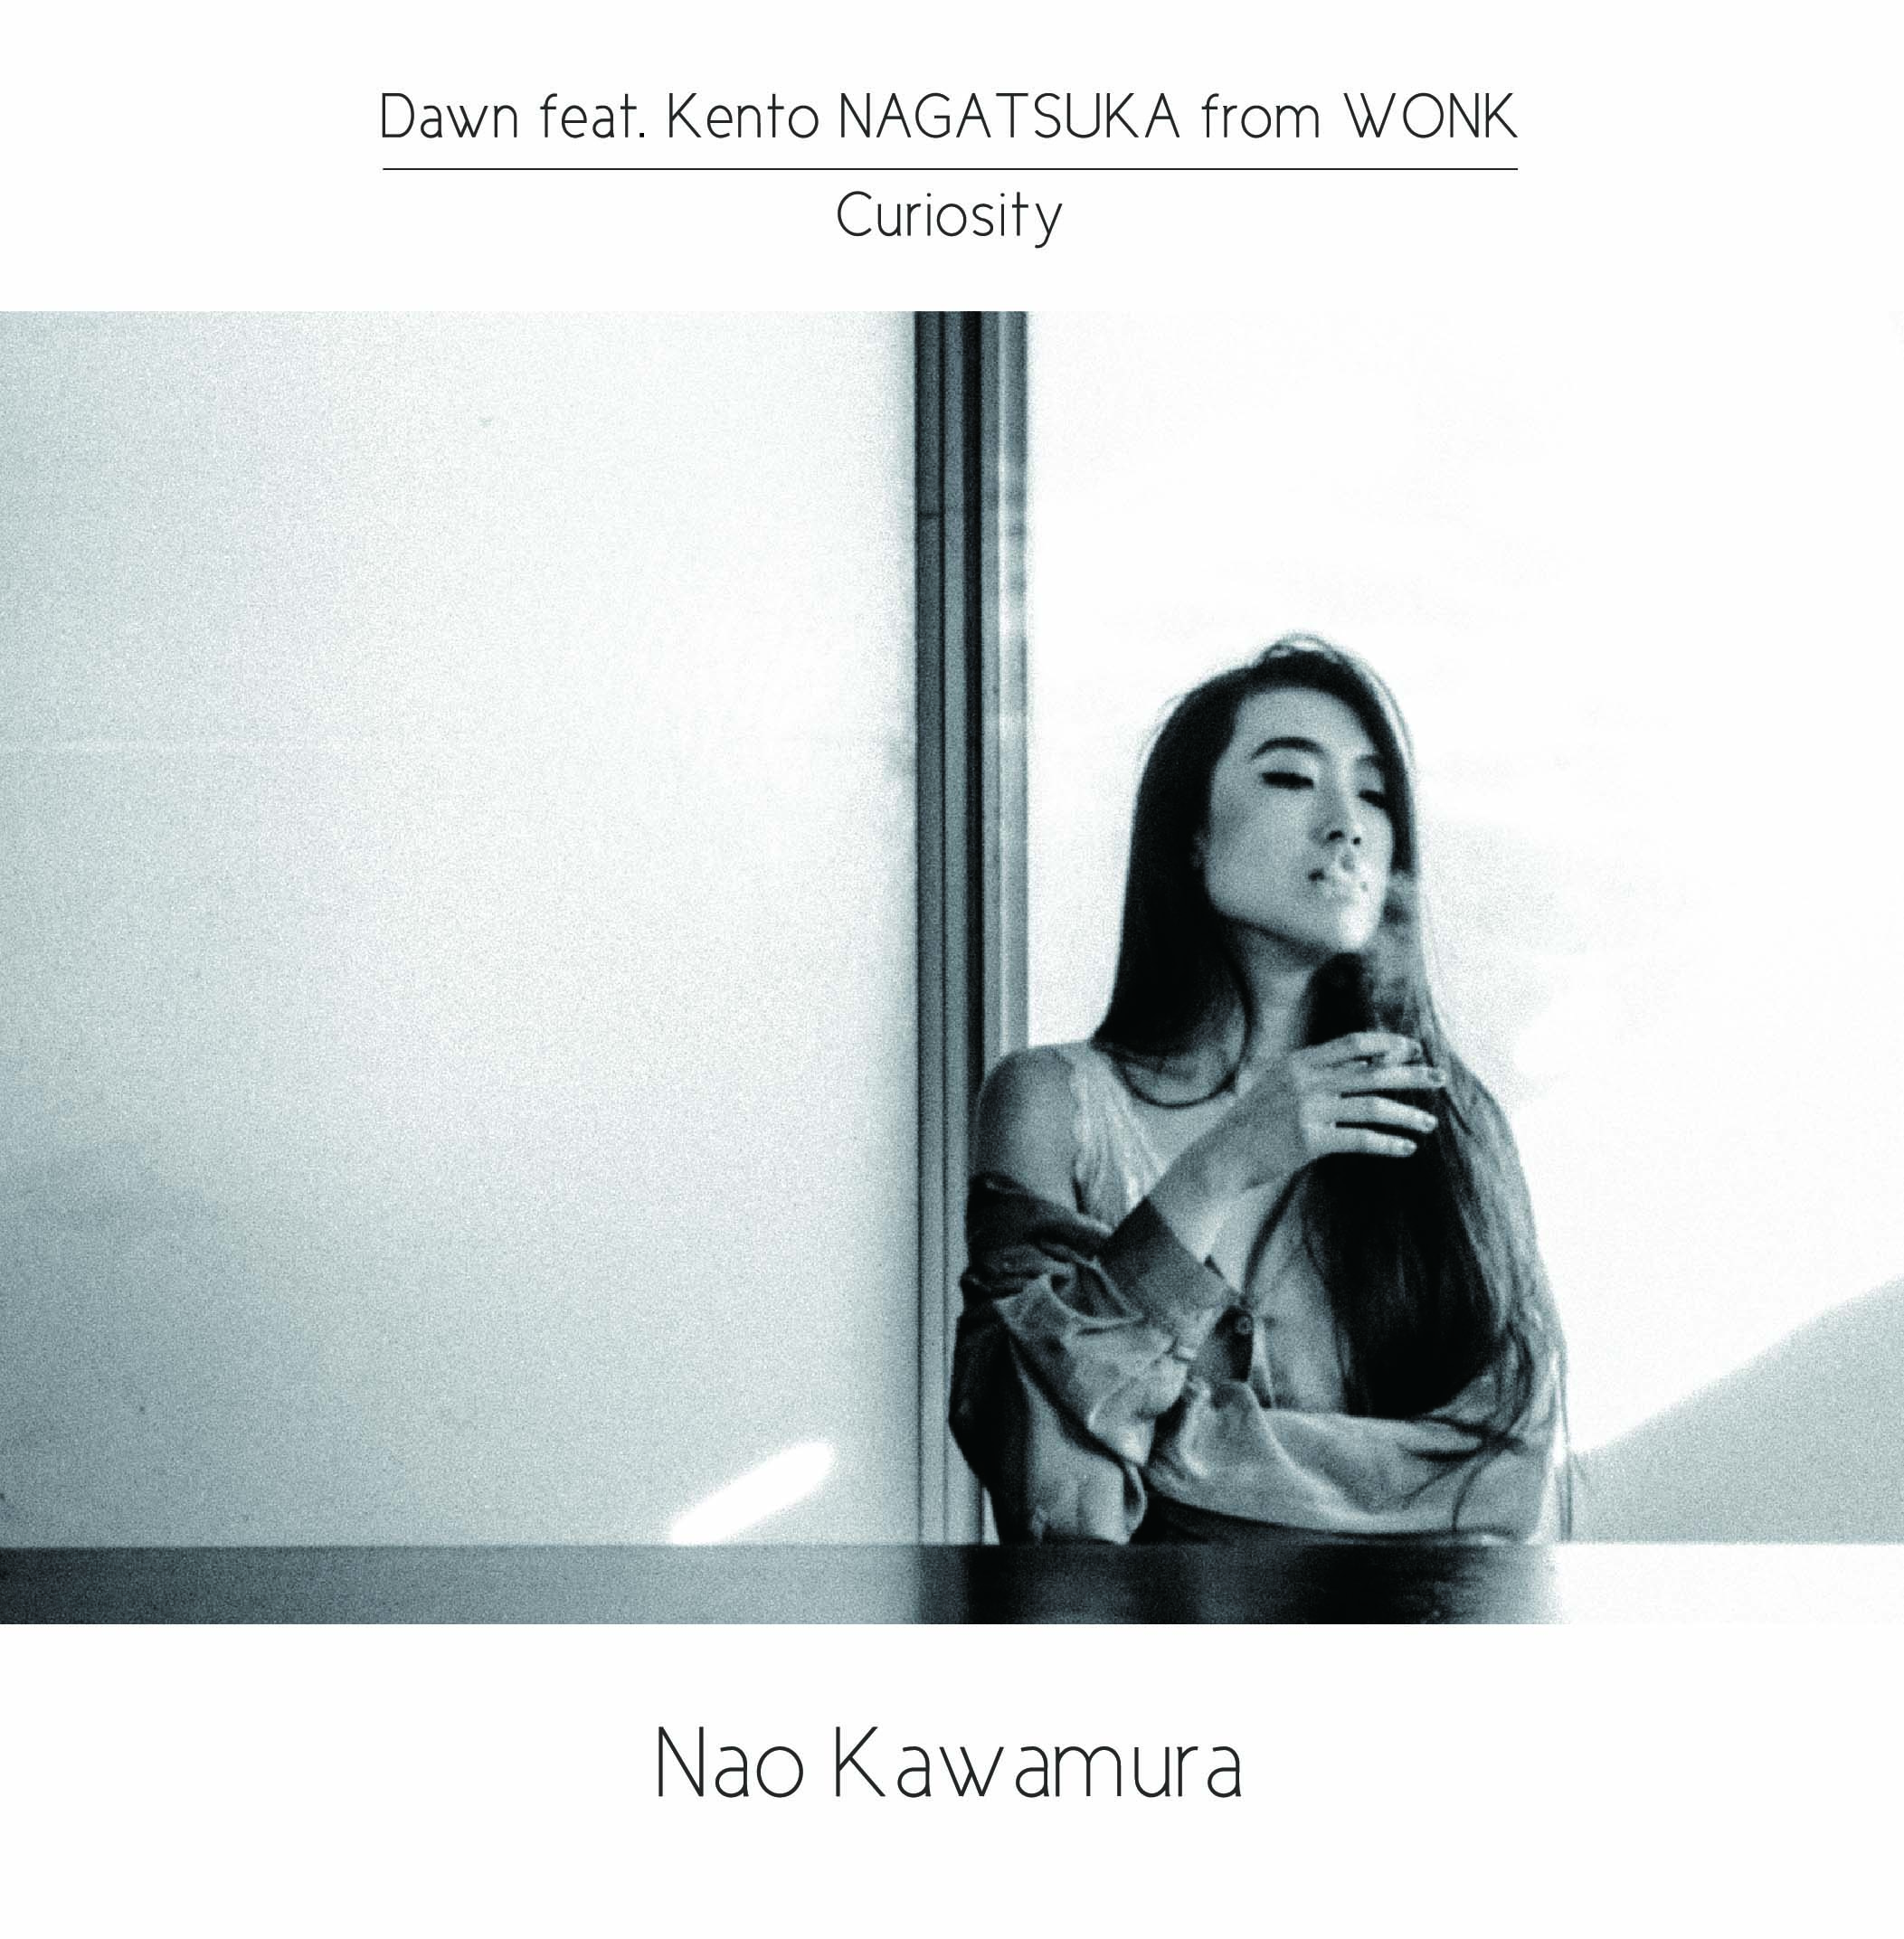 026 Nao Kawamura Dawn feat. Kento NAGATSUKA from WONK / Curiosity